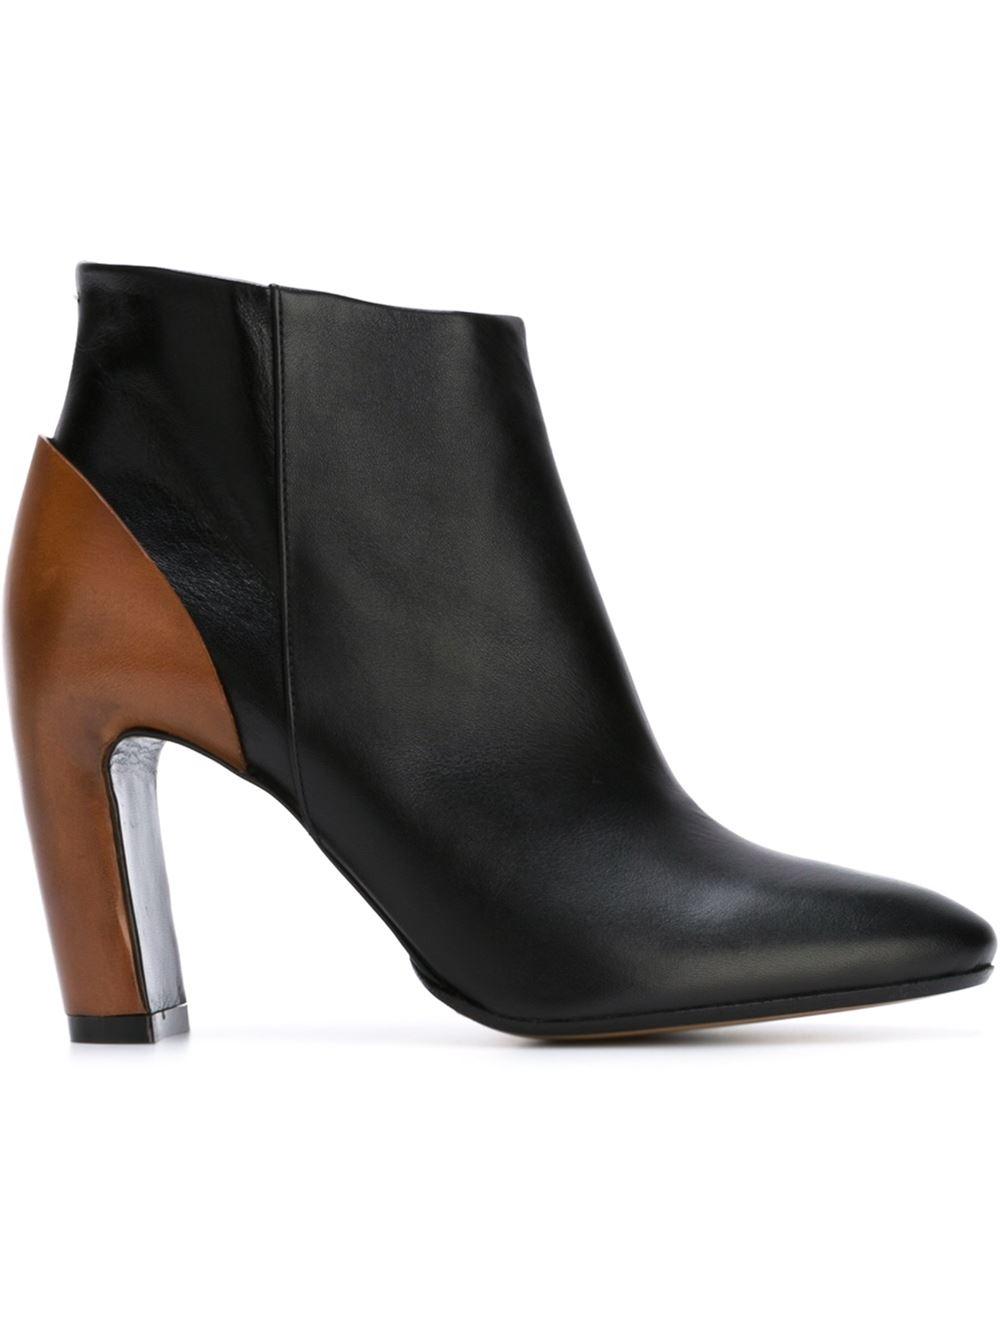 Maison Margiela contrast heel ankle boots, FarFetch.com